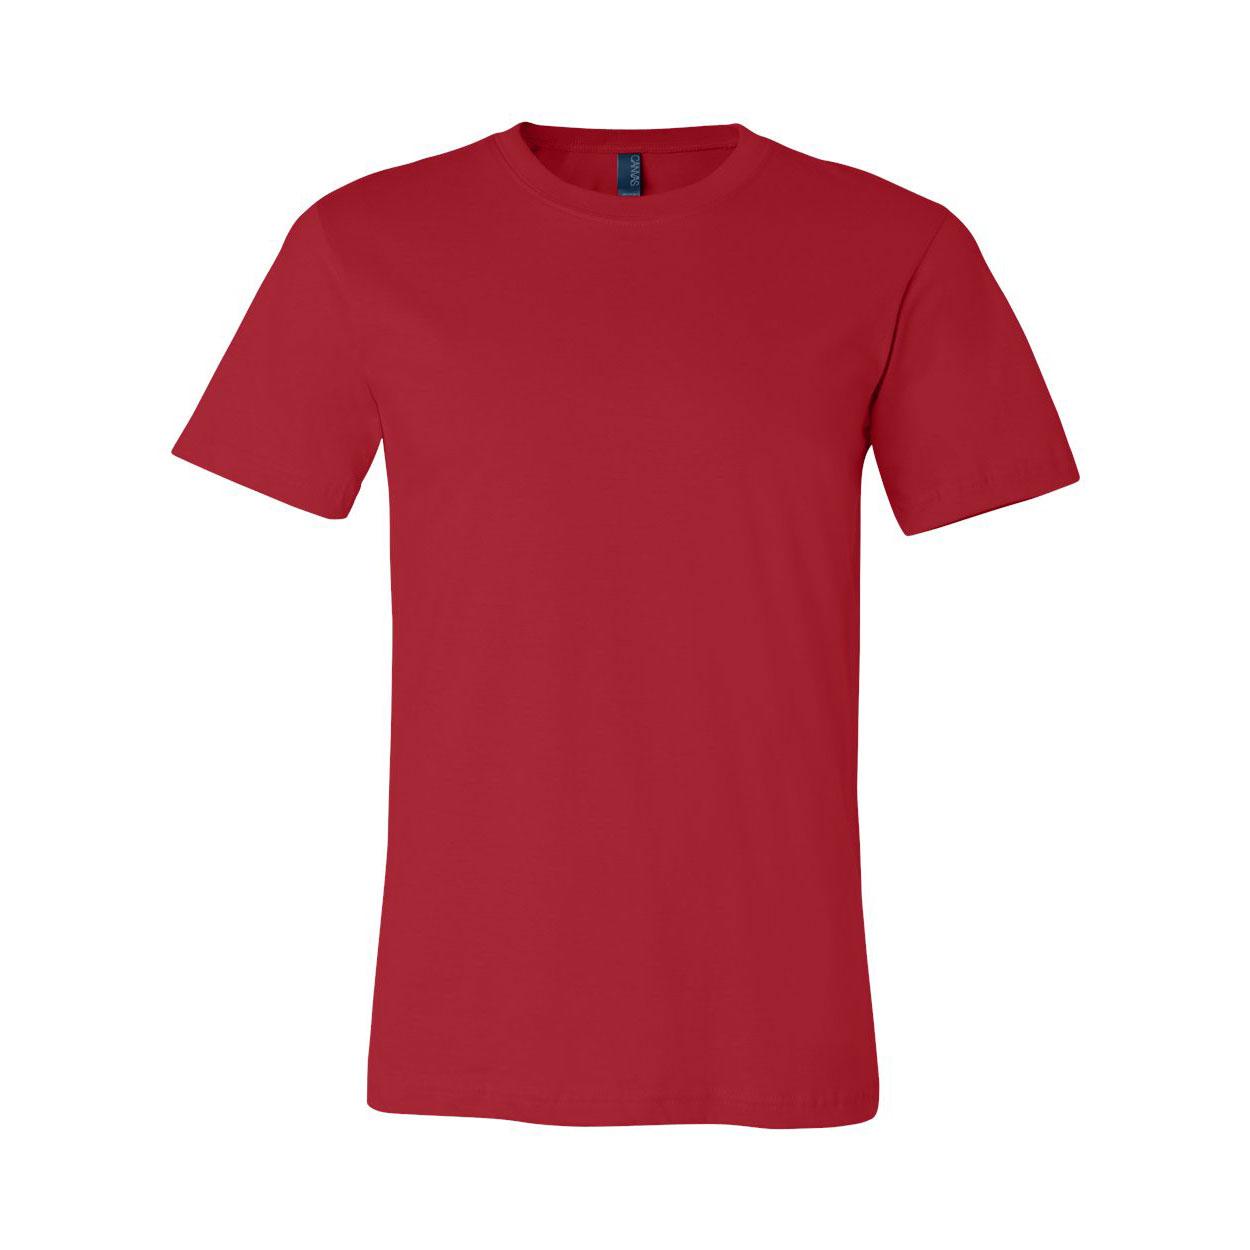 Red bella 3001